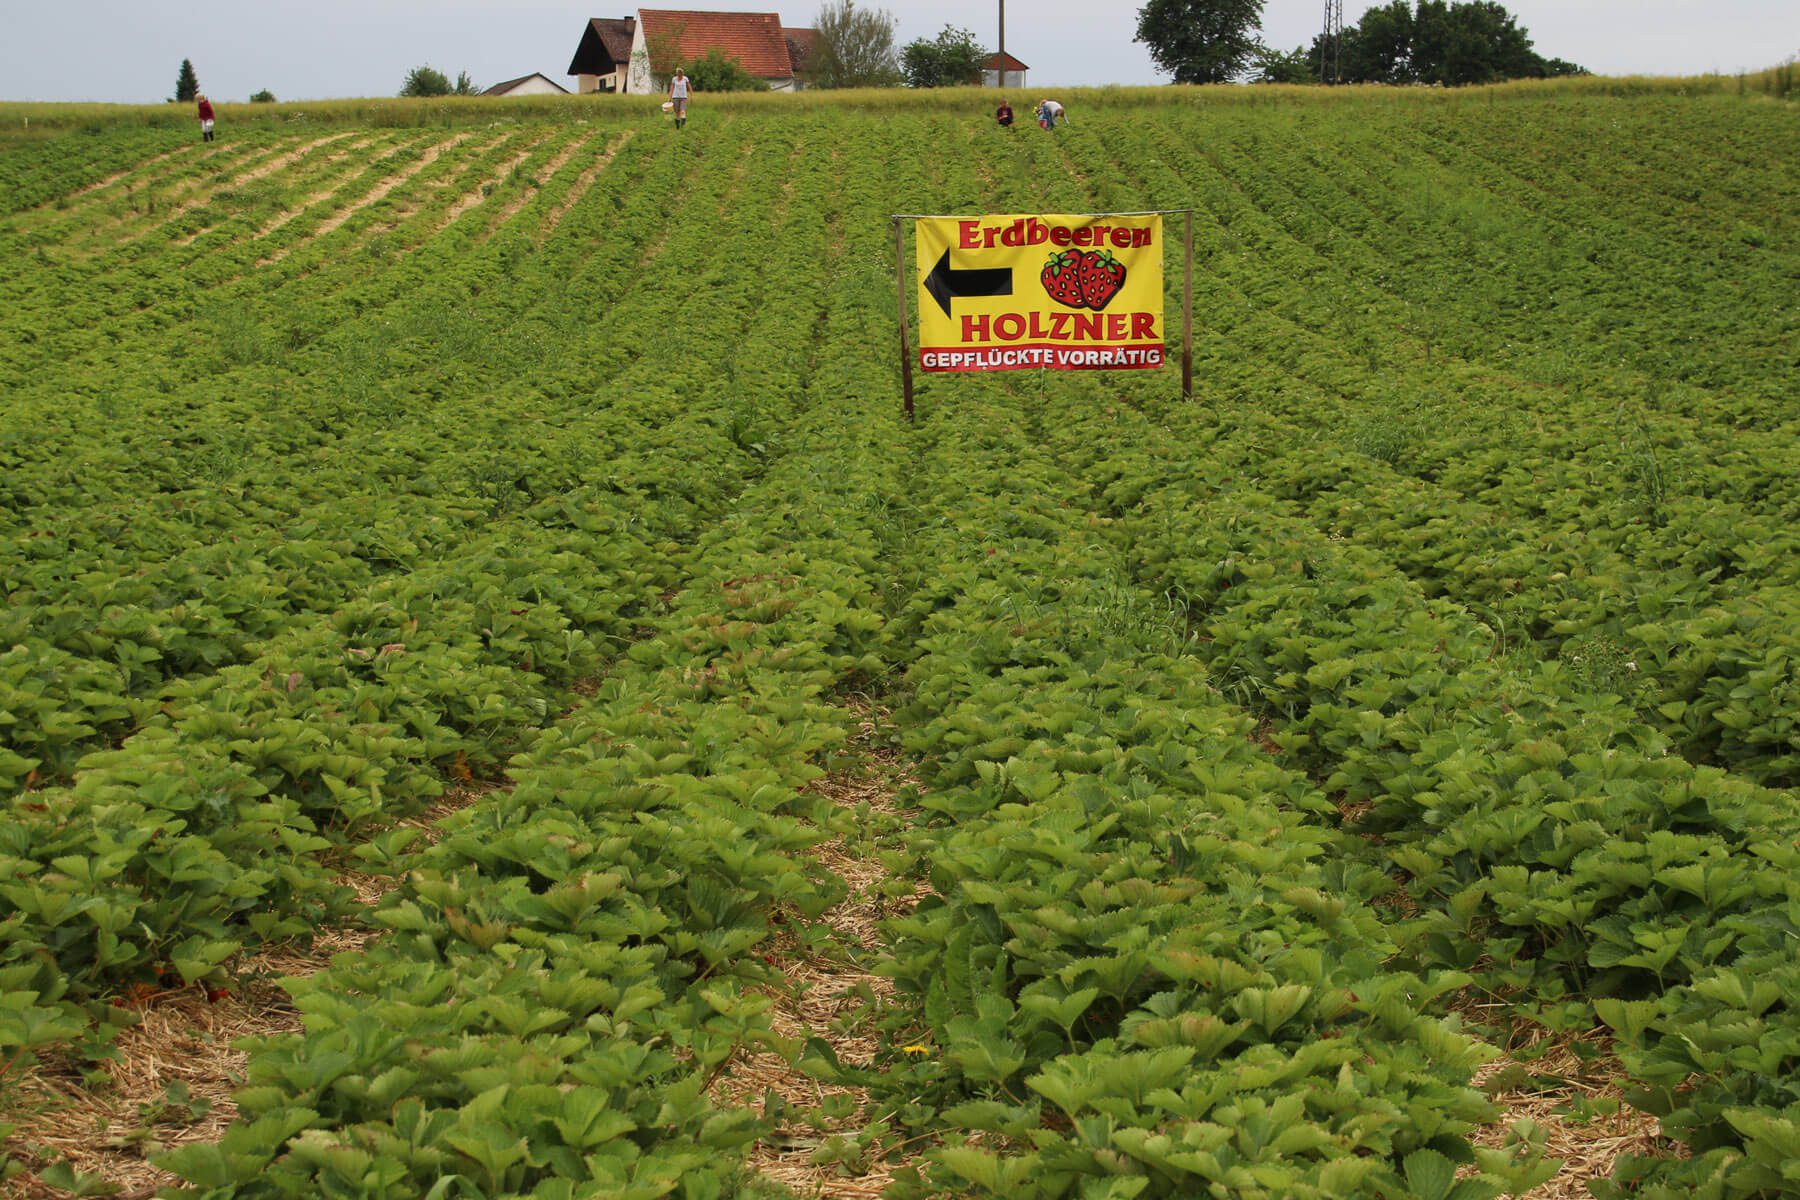 Unser Erdbeerfeld - Erdbeeren Holzner in Euernbach